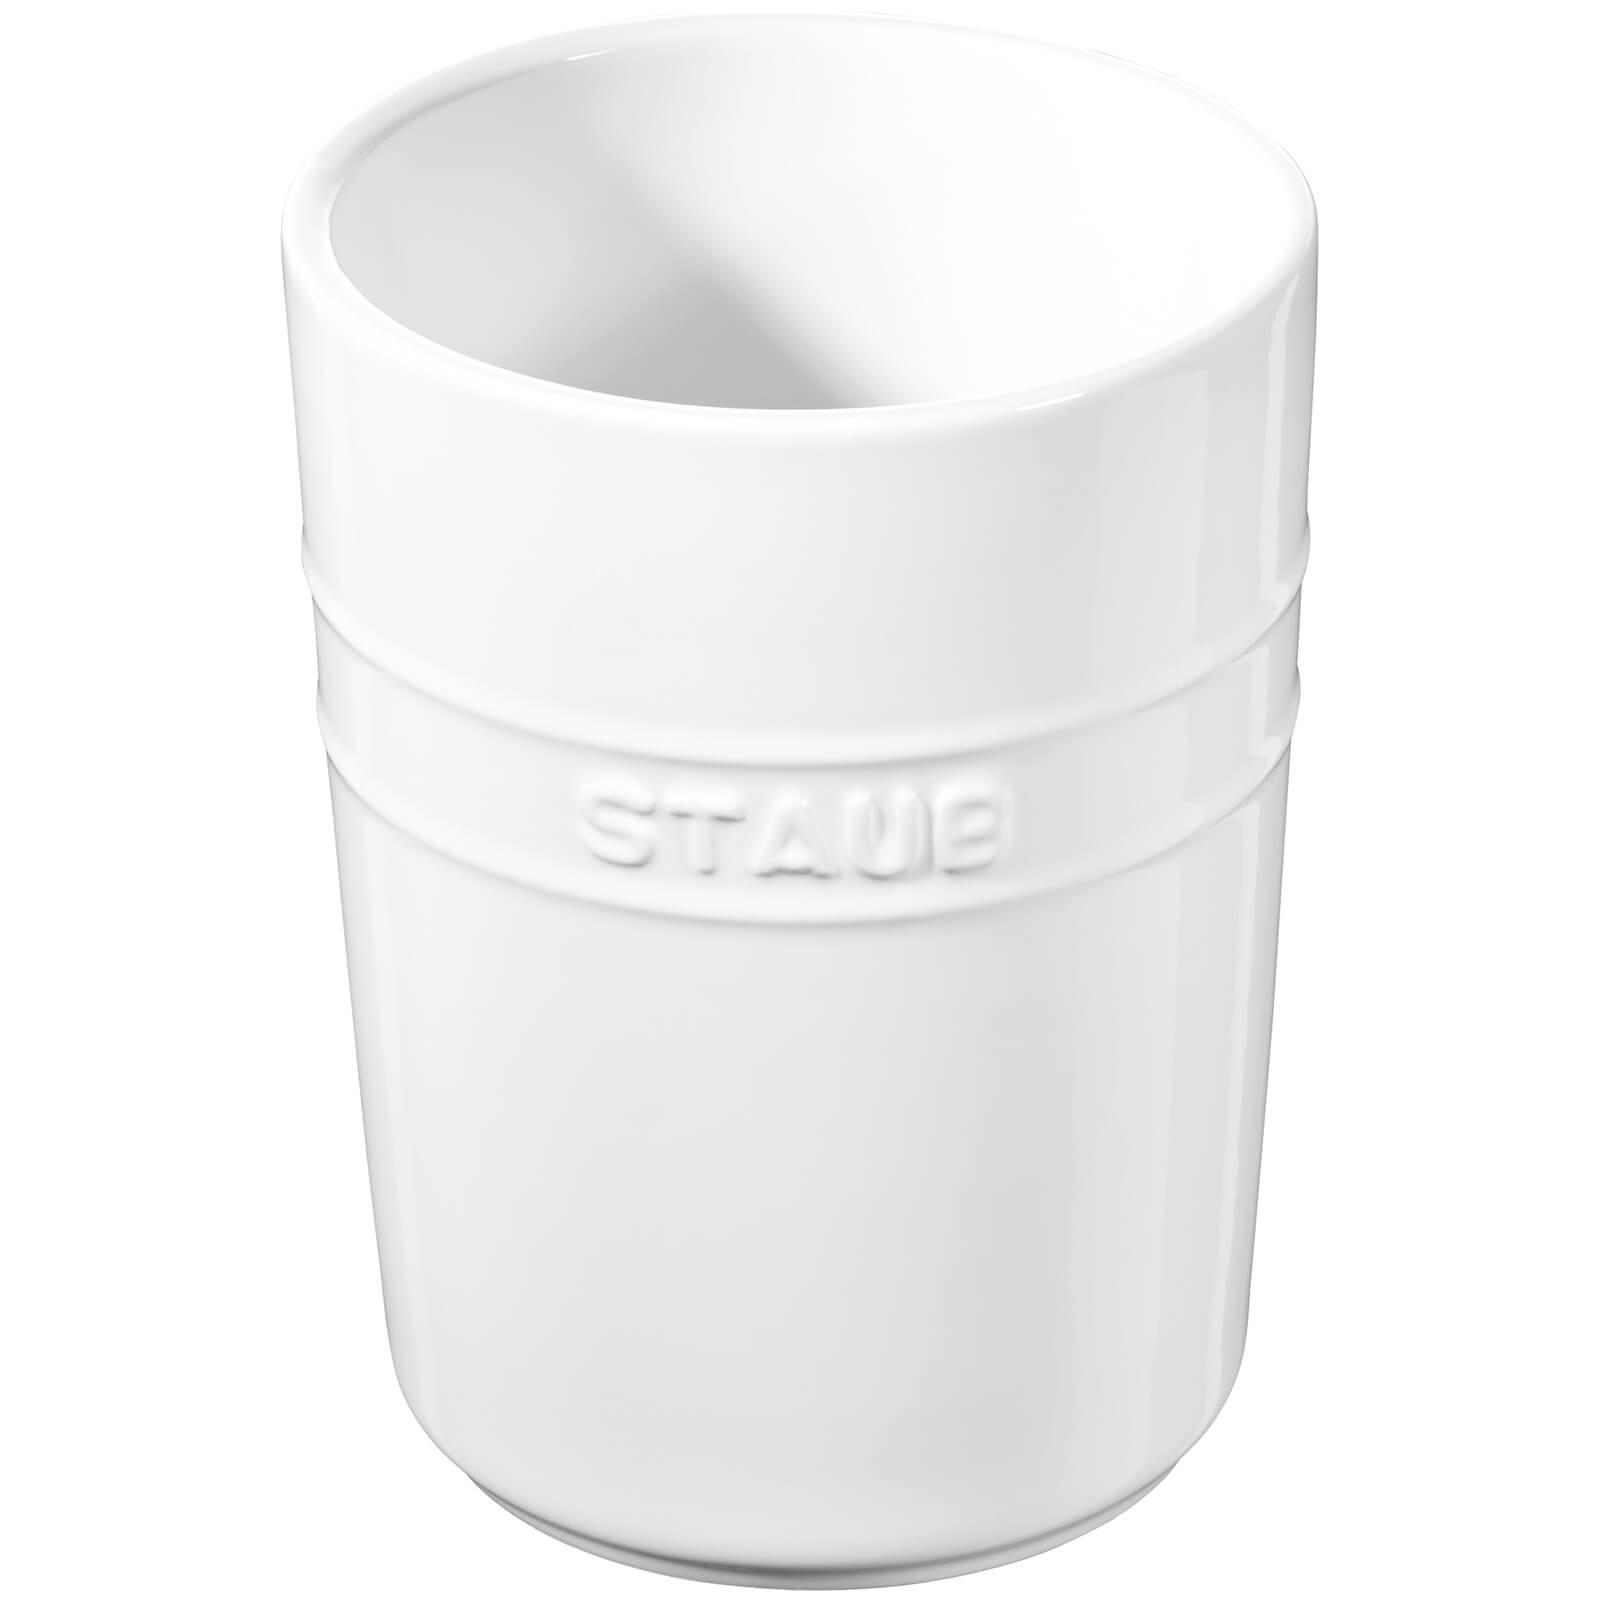 Staub Ceramic Round Utensil Holder - White